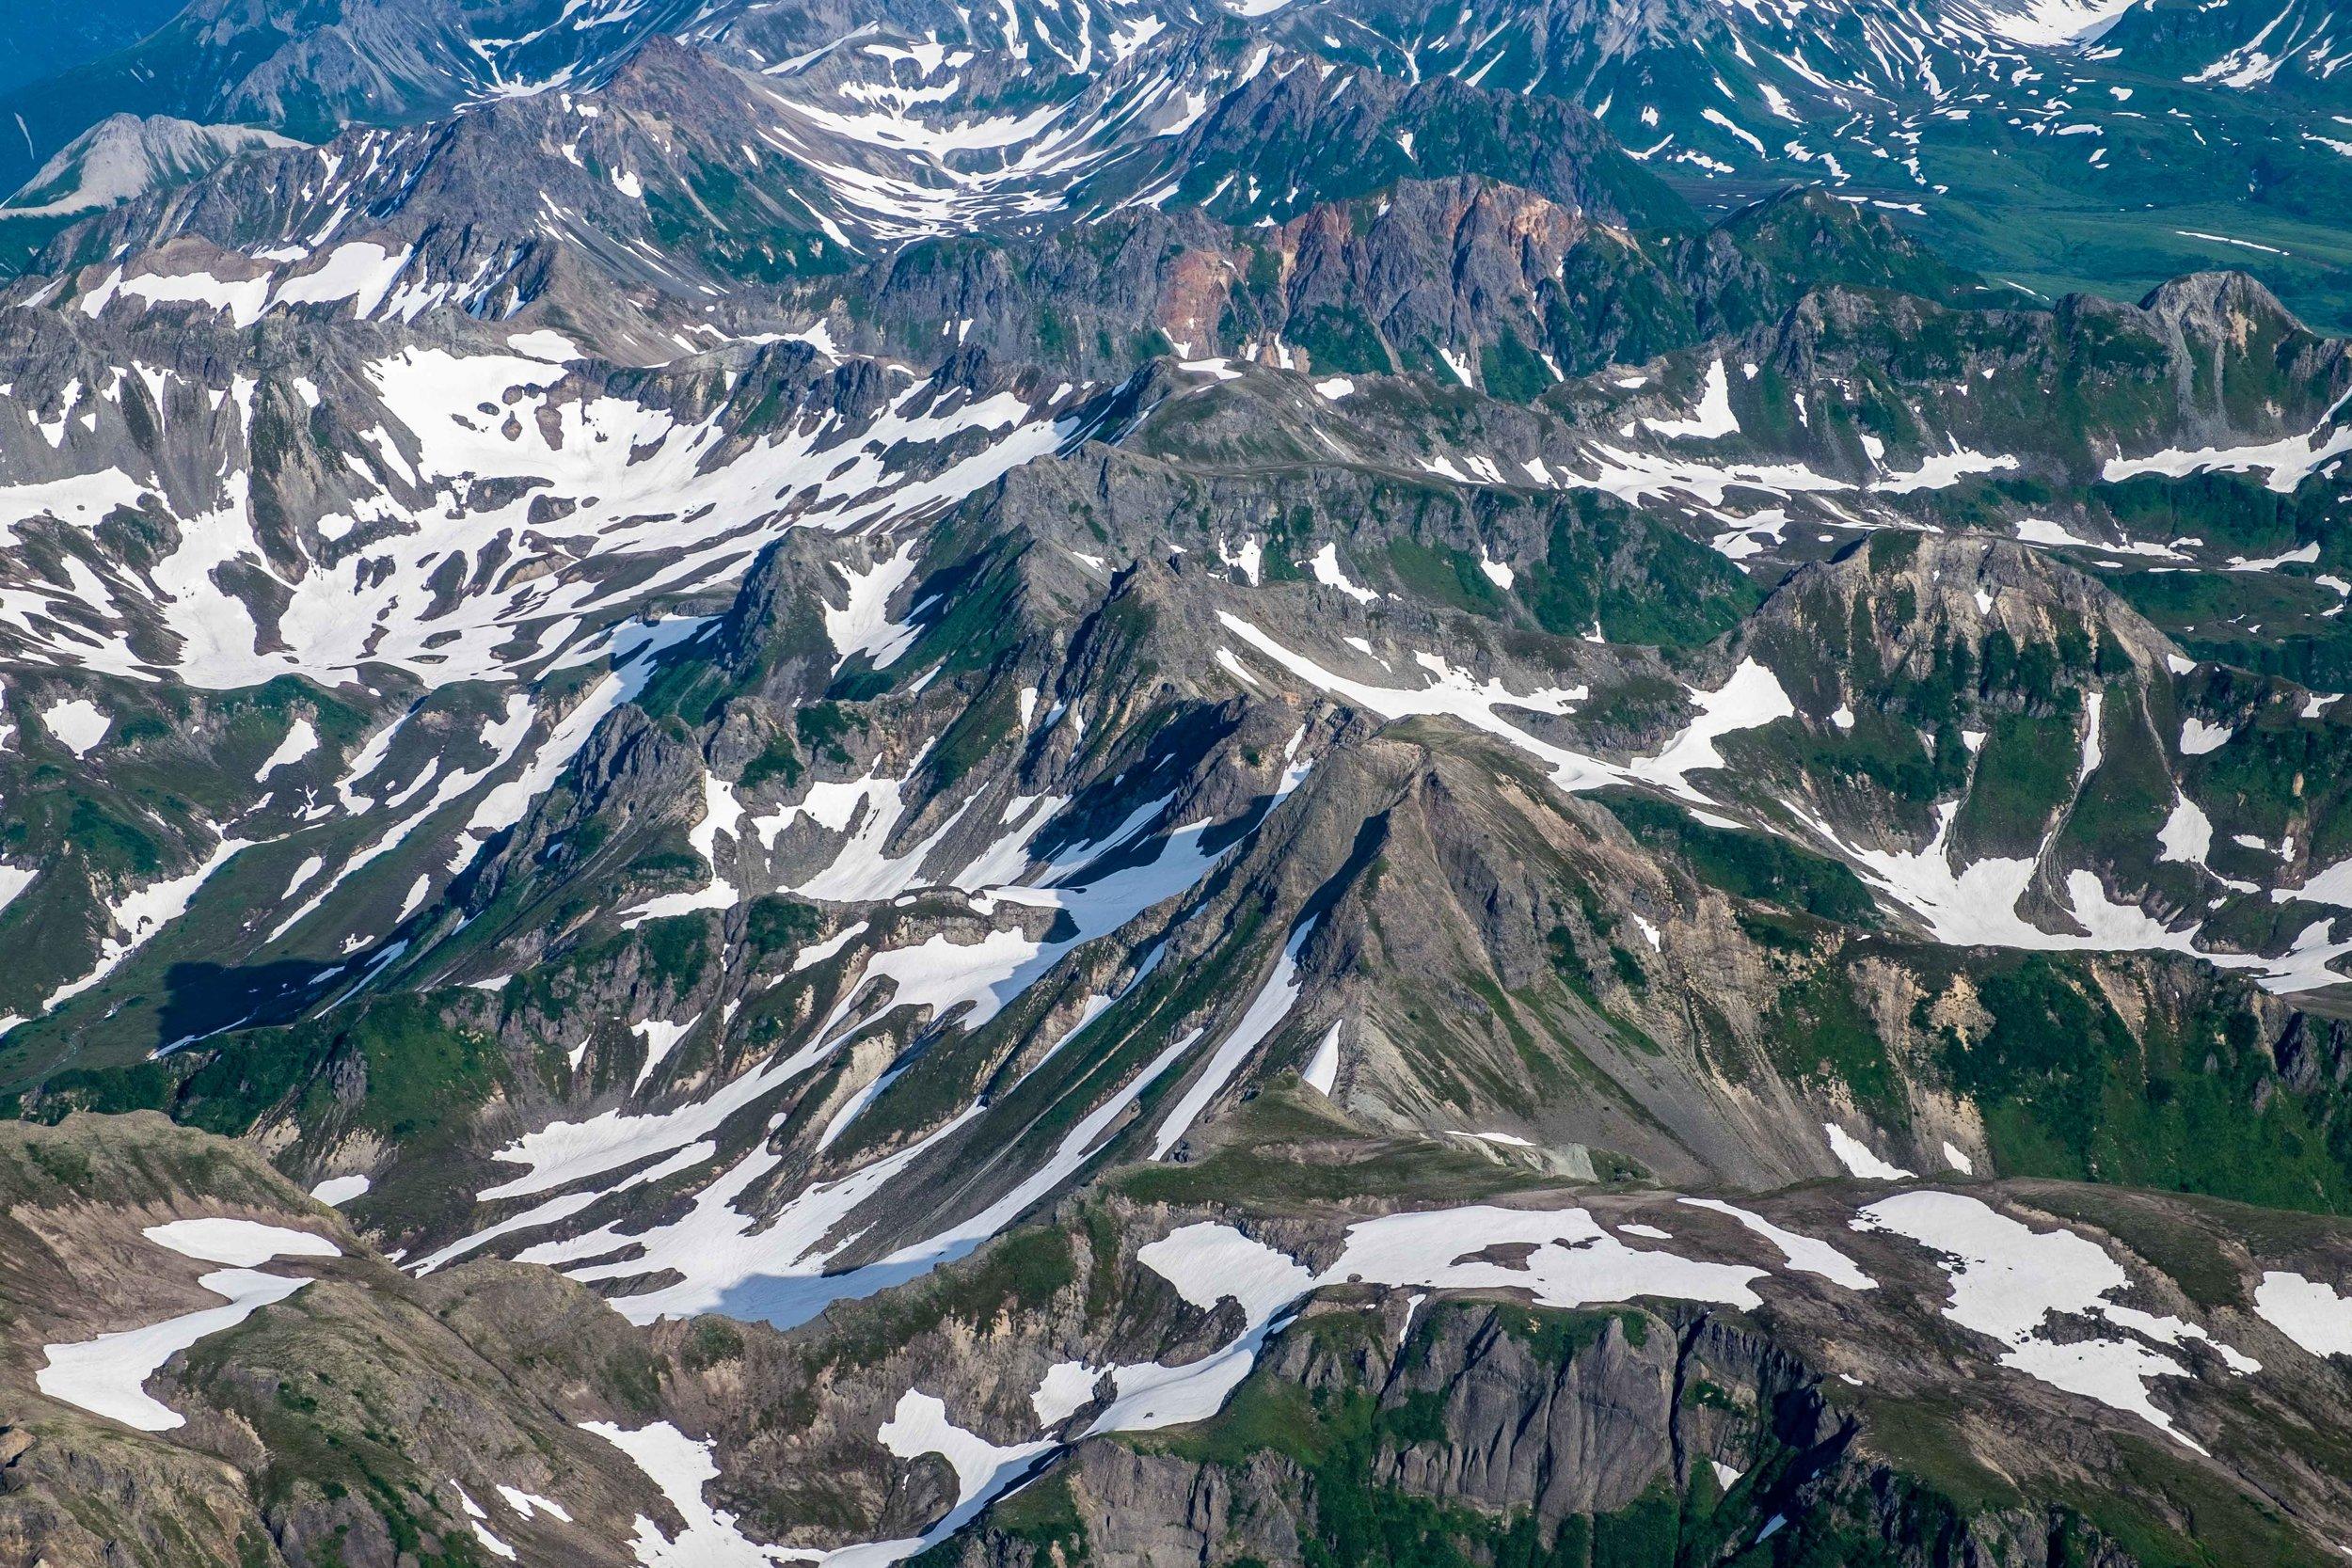 20160720-JI-Katmai National Park-_DSF2355-2.jpg